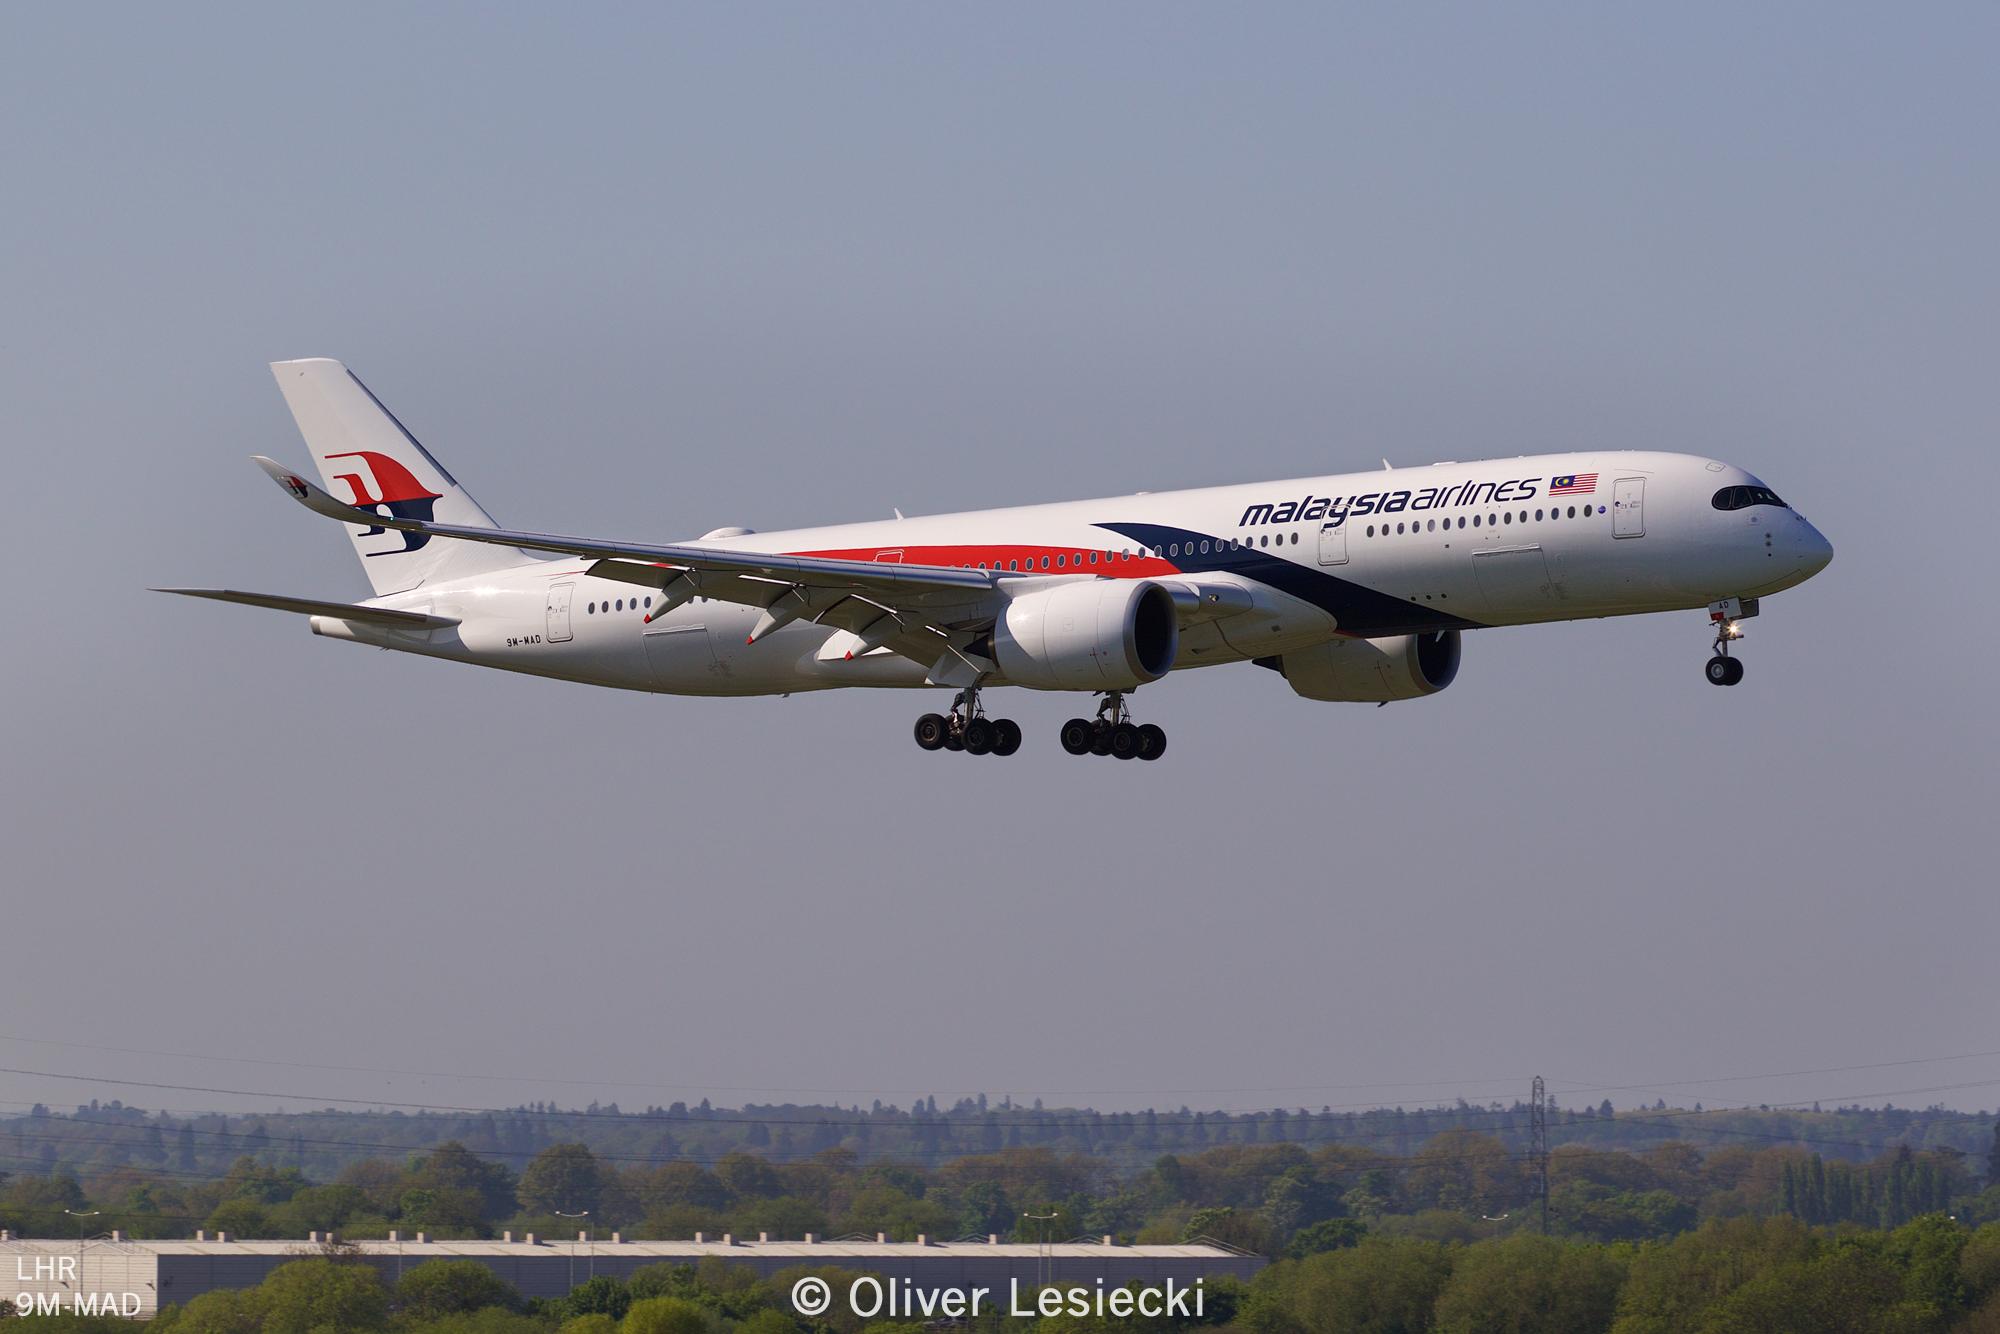 X_Malaysia_A350_9MMAD_02_LHR_050518_IG7